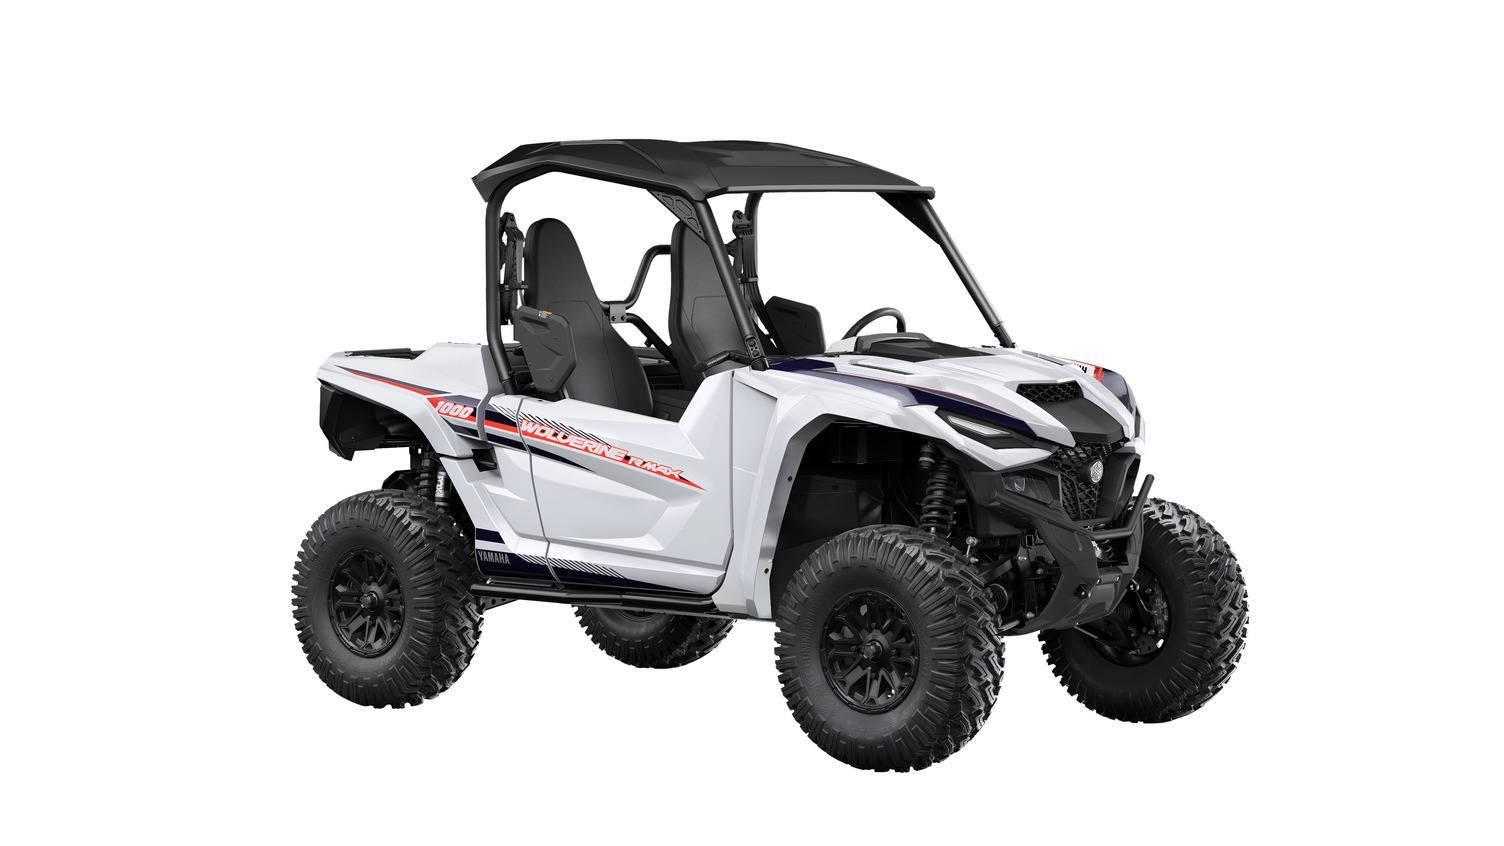 Yamaha Wolverine RMAX 1000 Bumpers